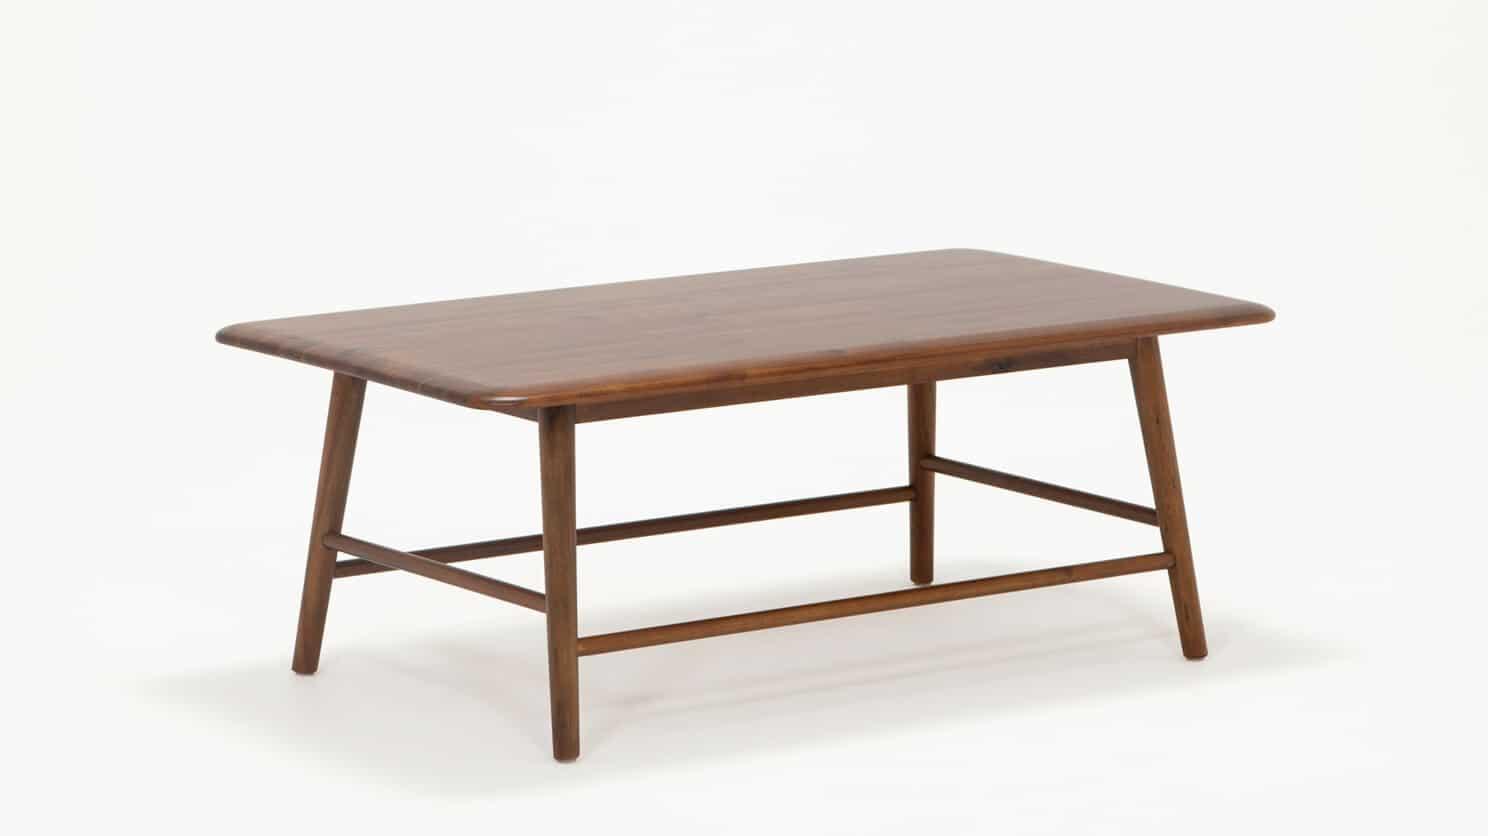 7110 032 49 2 coffee tables kacia rectangular coffee table corner 01